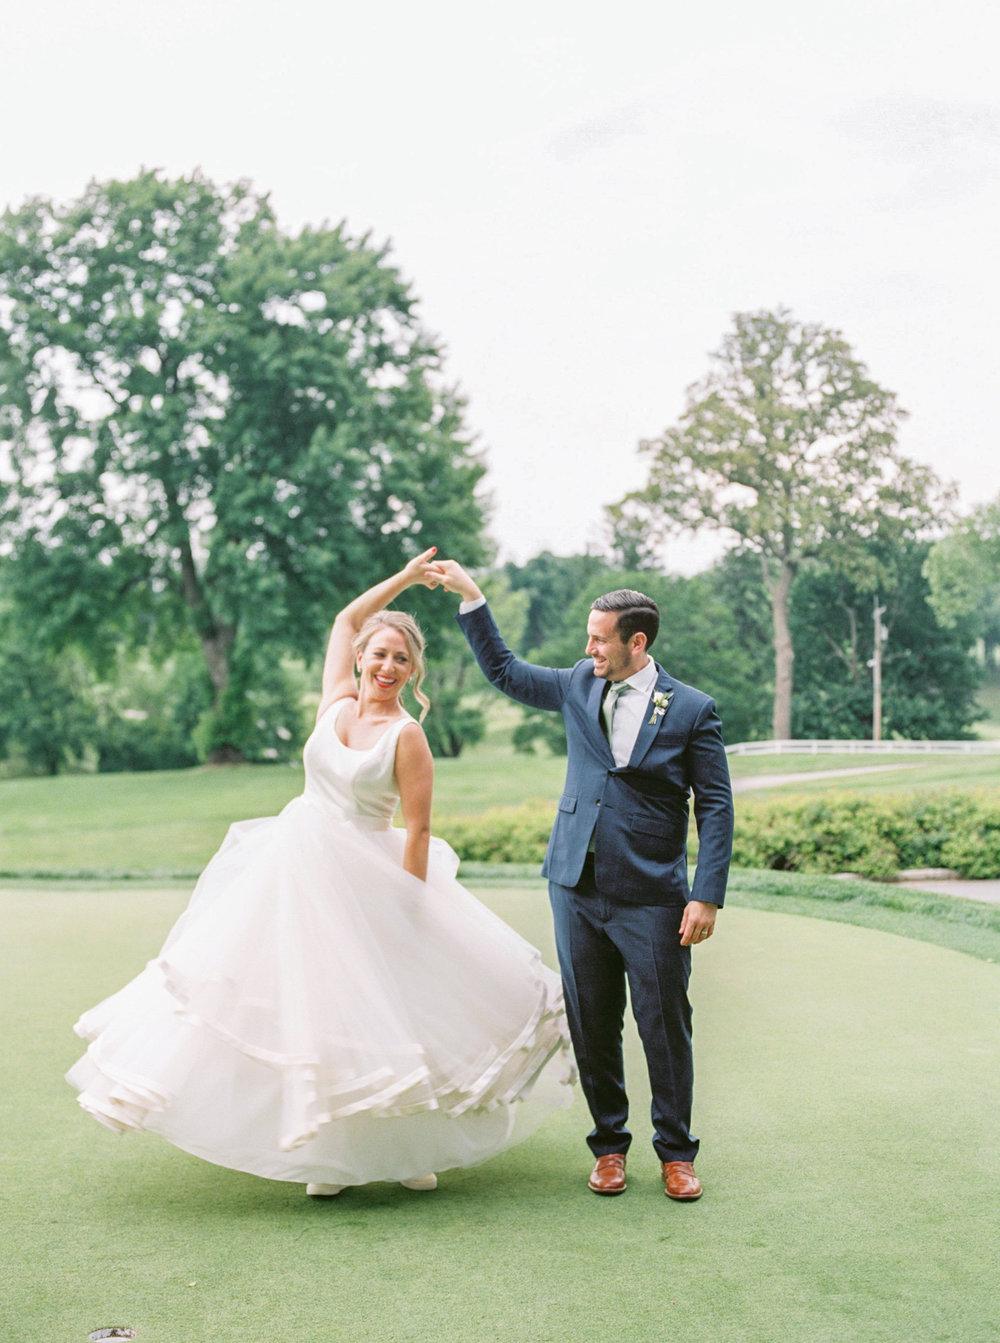 haley-richter-photography-keristin-gaber-associate-baltimore-country-club-spring-wedding-italian-lemon-inspired-154.jpg